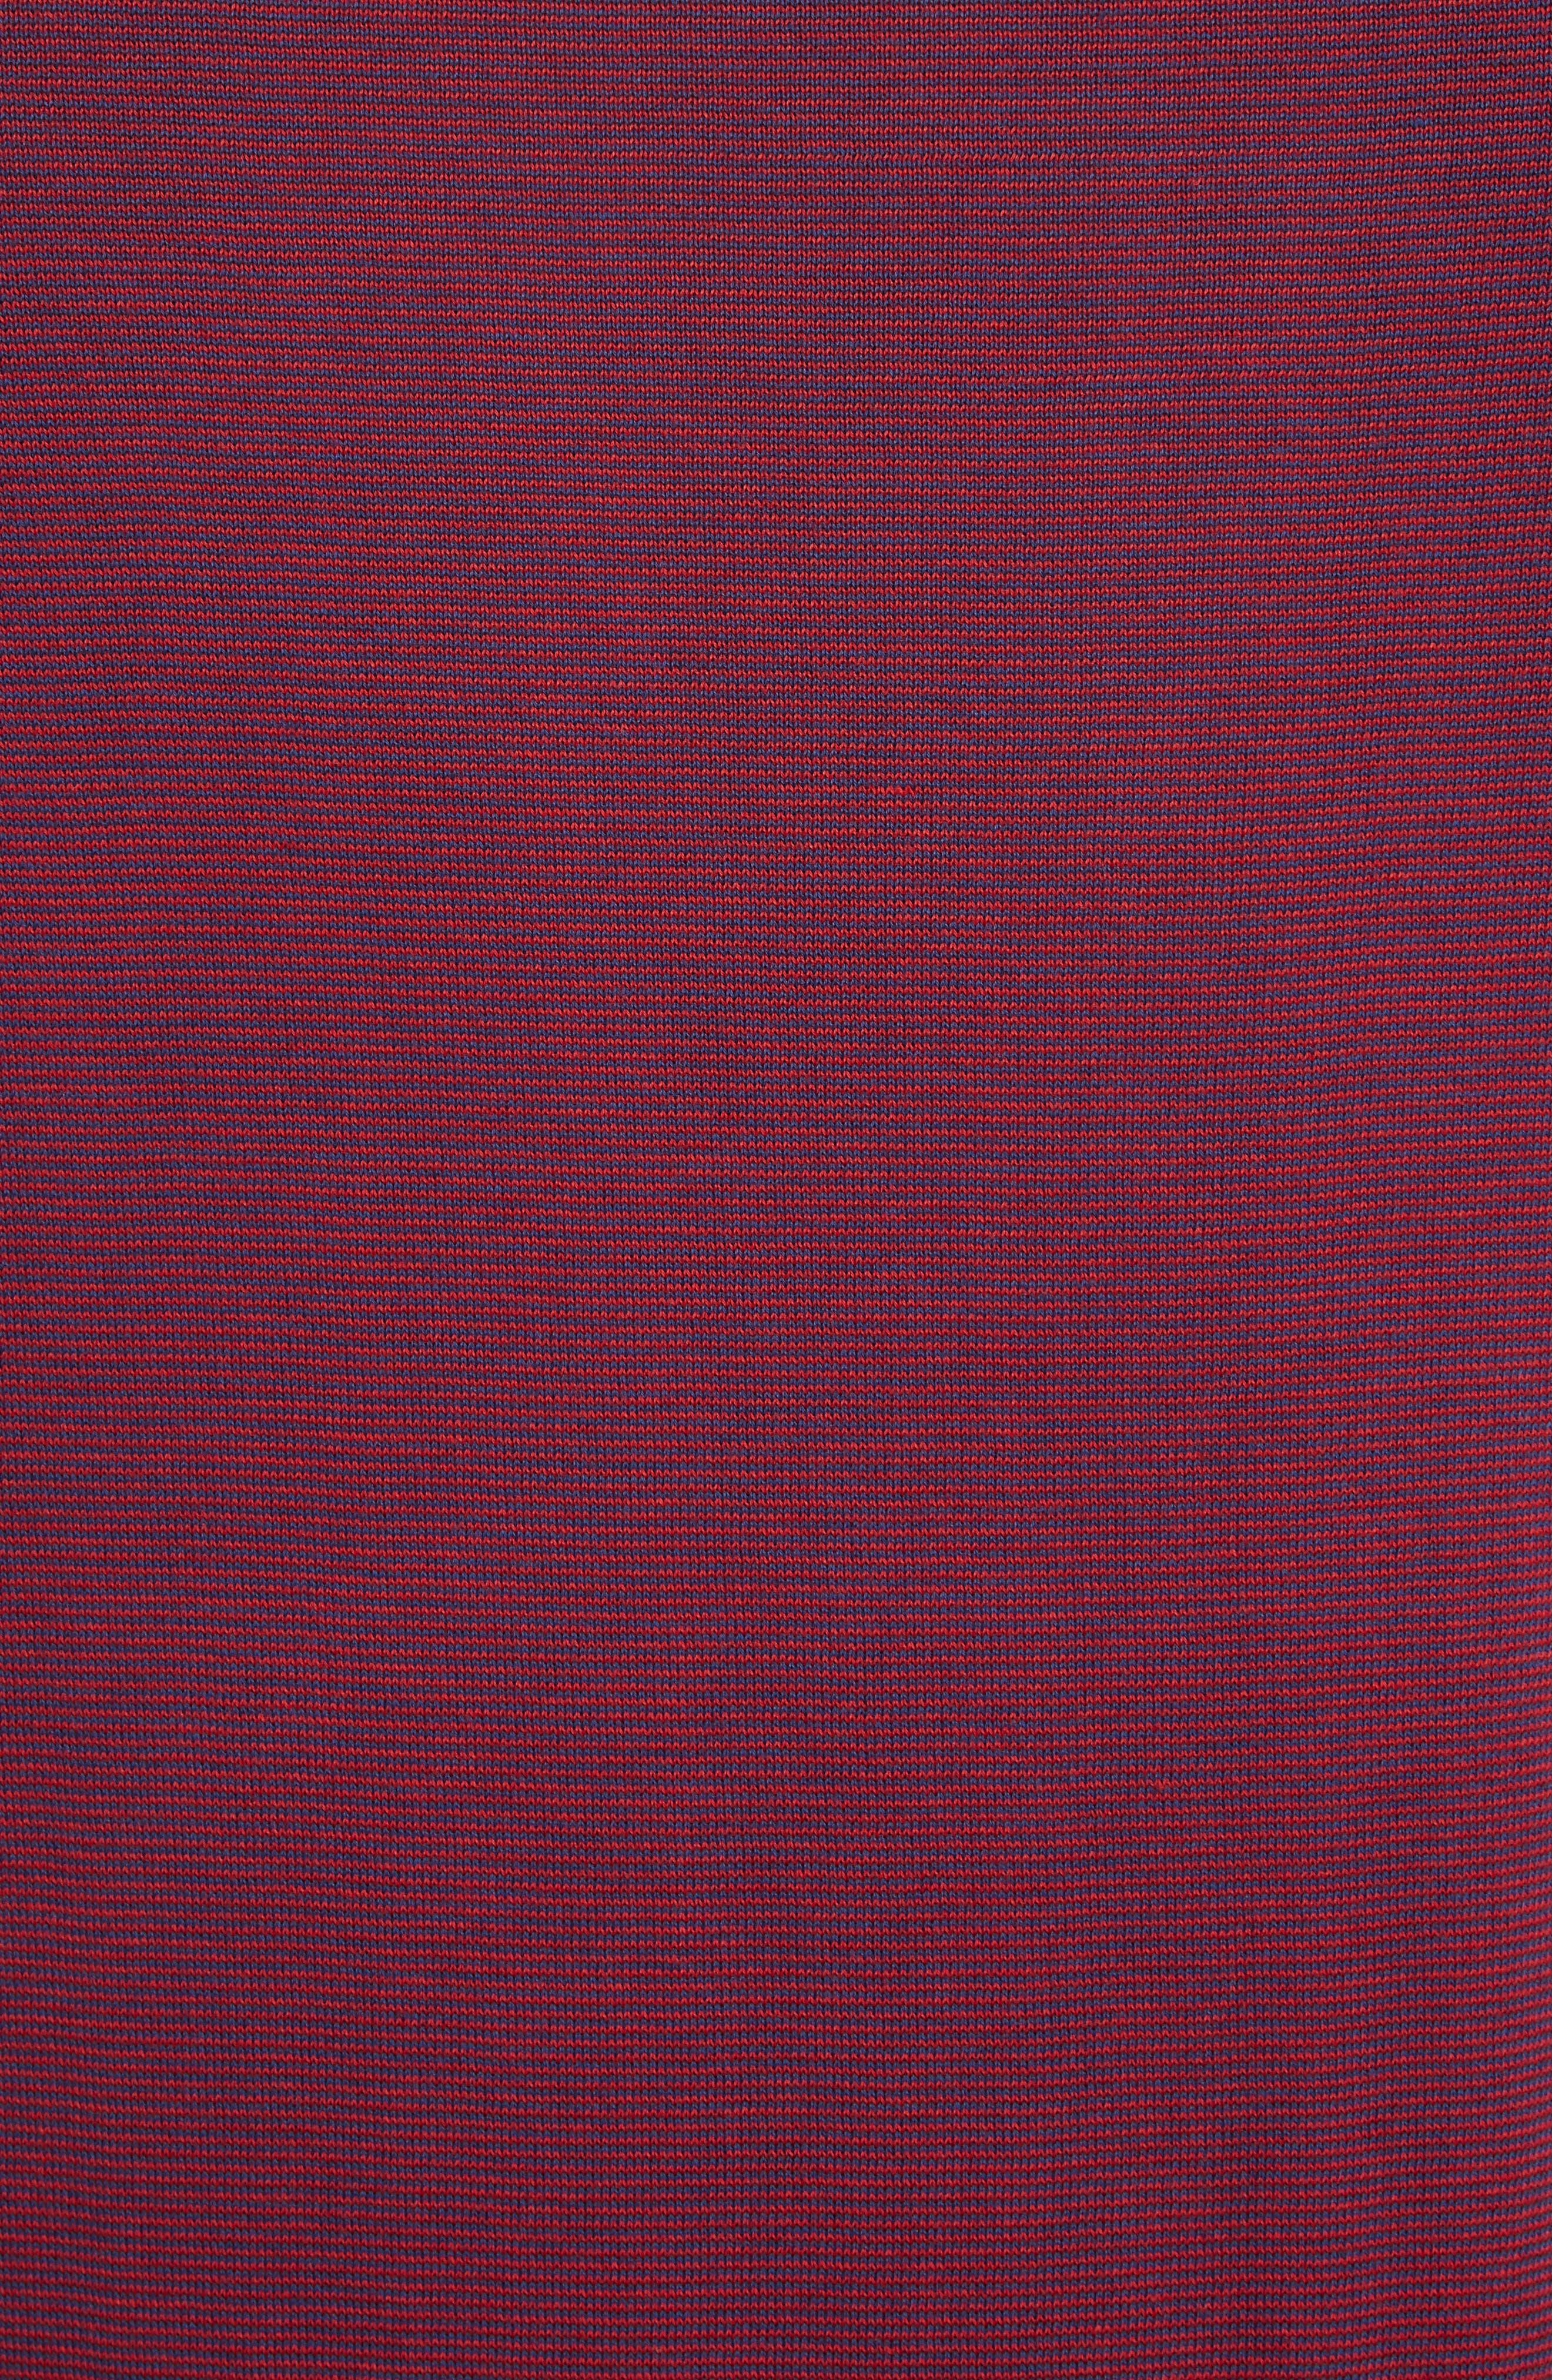 Ministripe Crewneck Sweater,                             Alternate thumbnail 5, color,                             415